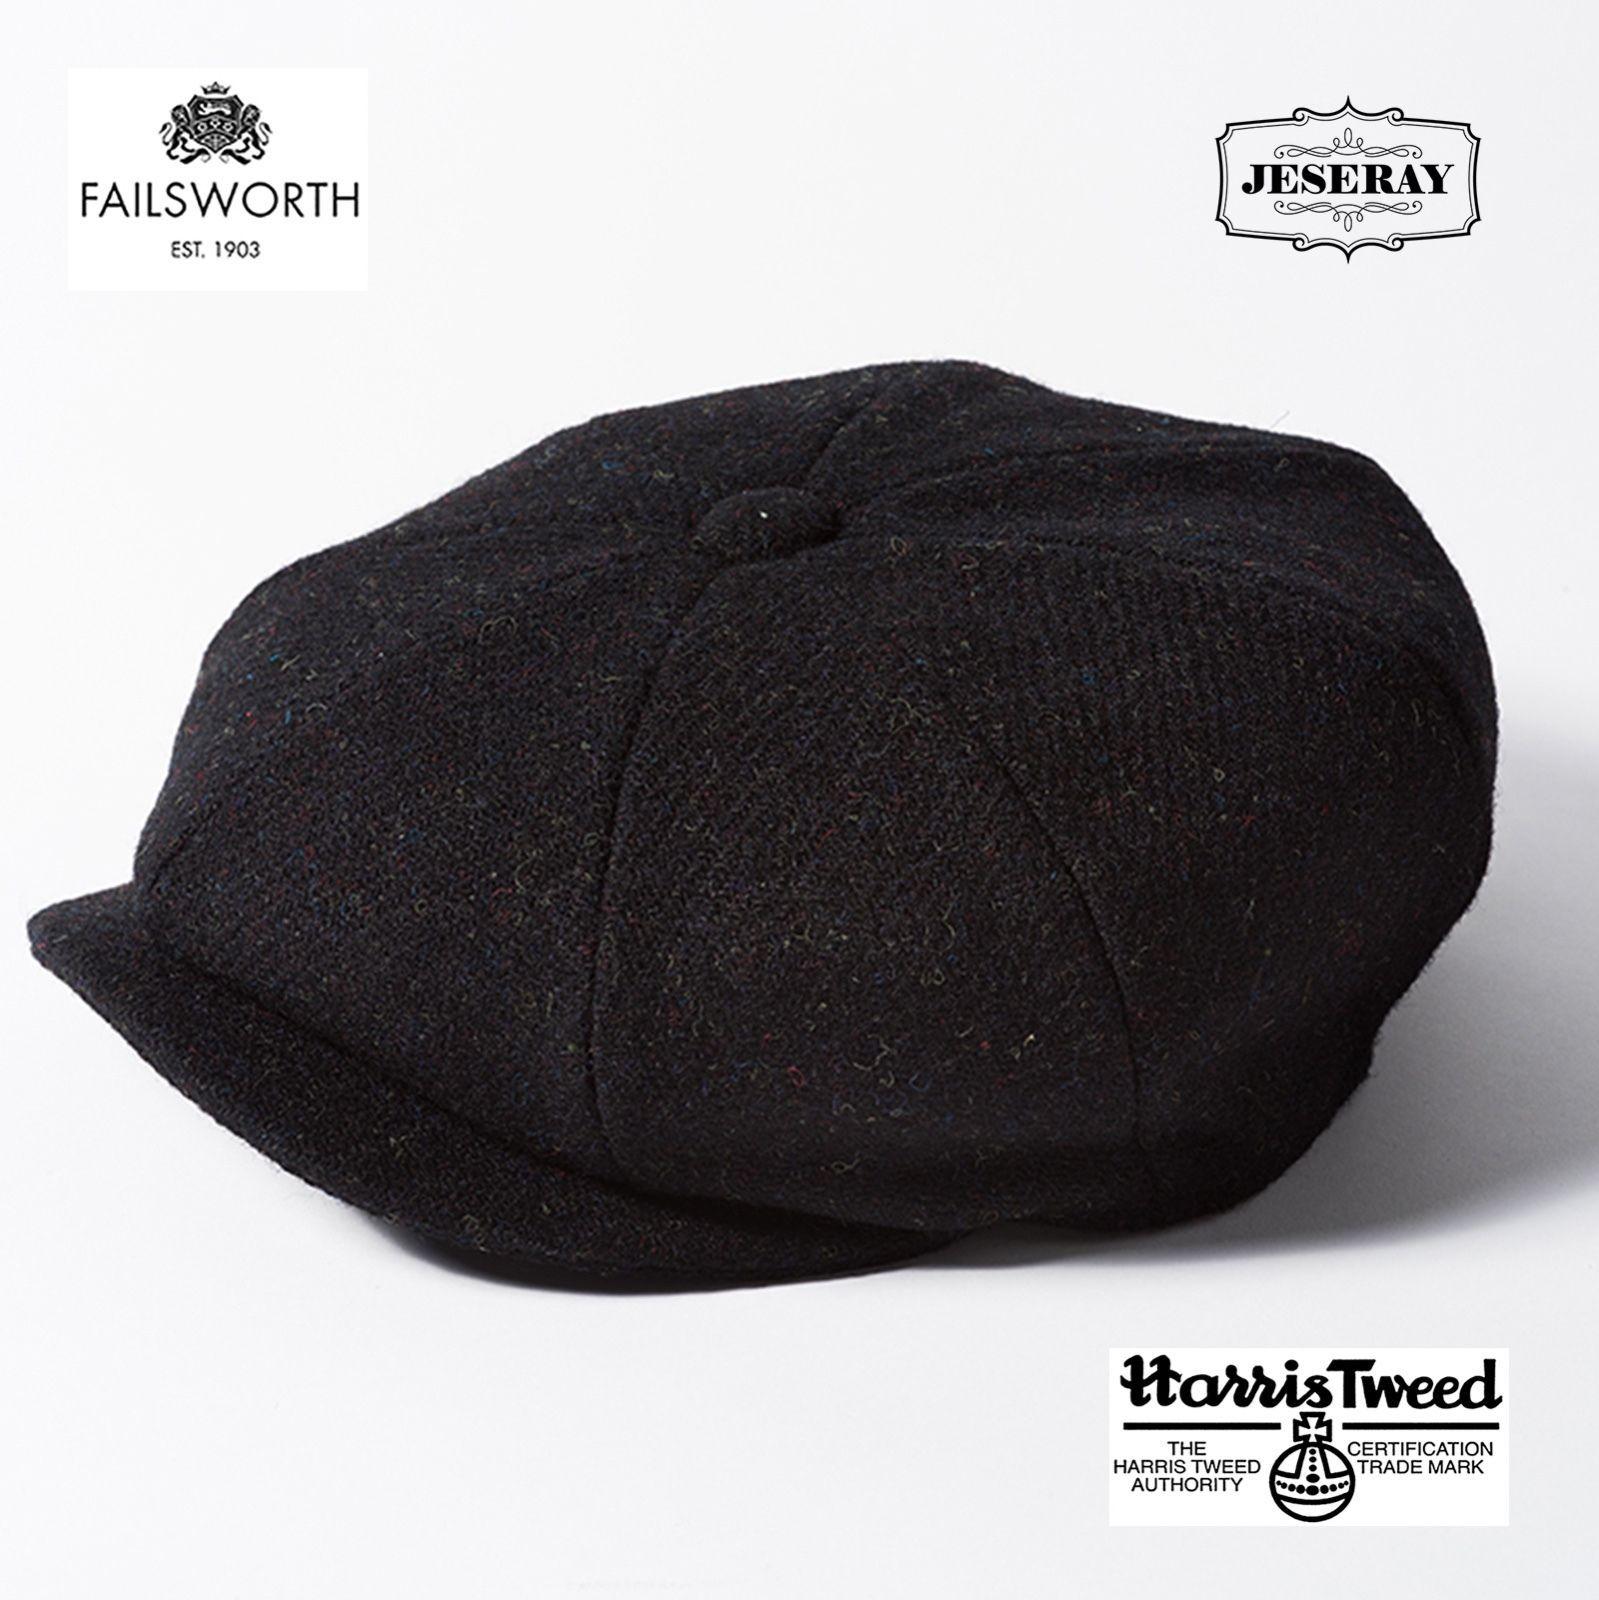 e6e3f8061 Mens Hats 163619: Failsworth Carloway Black Harris Tweed 8 Panel ...